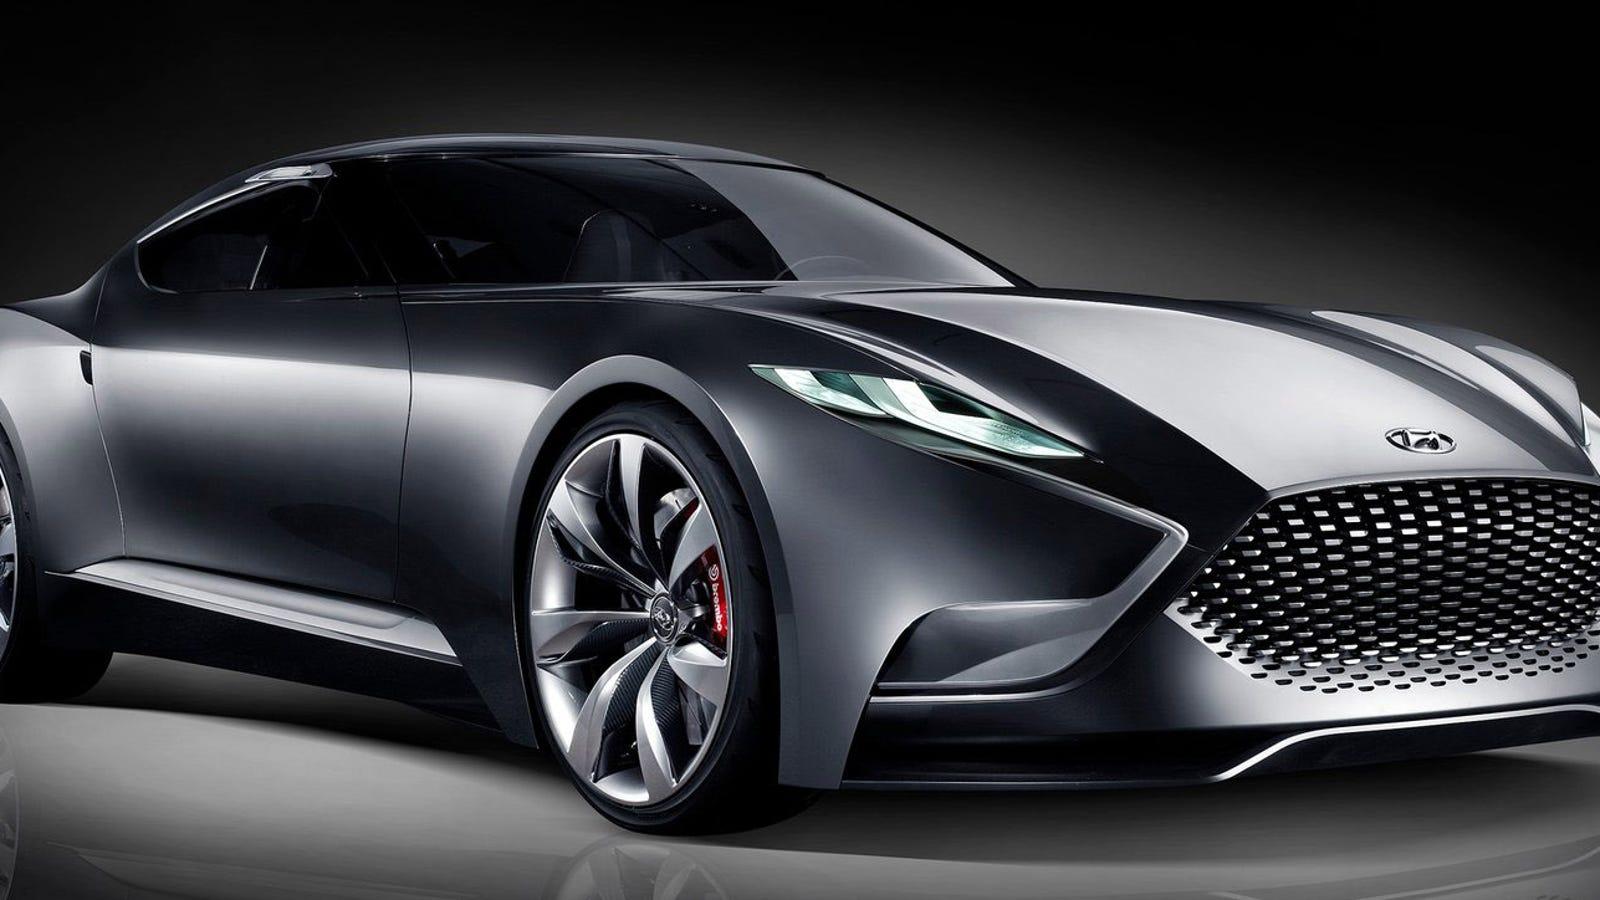 2015 hyundai genesis coupe v8. 2015 hyundai genesis coupe v8 h